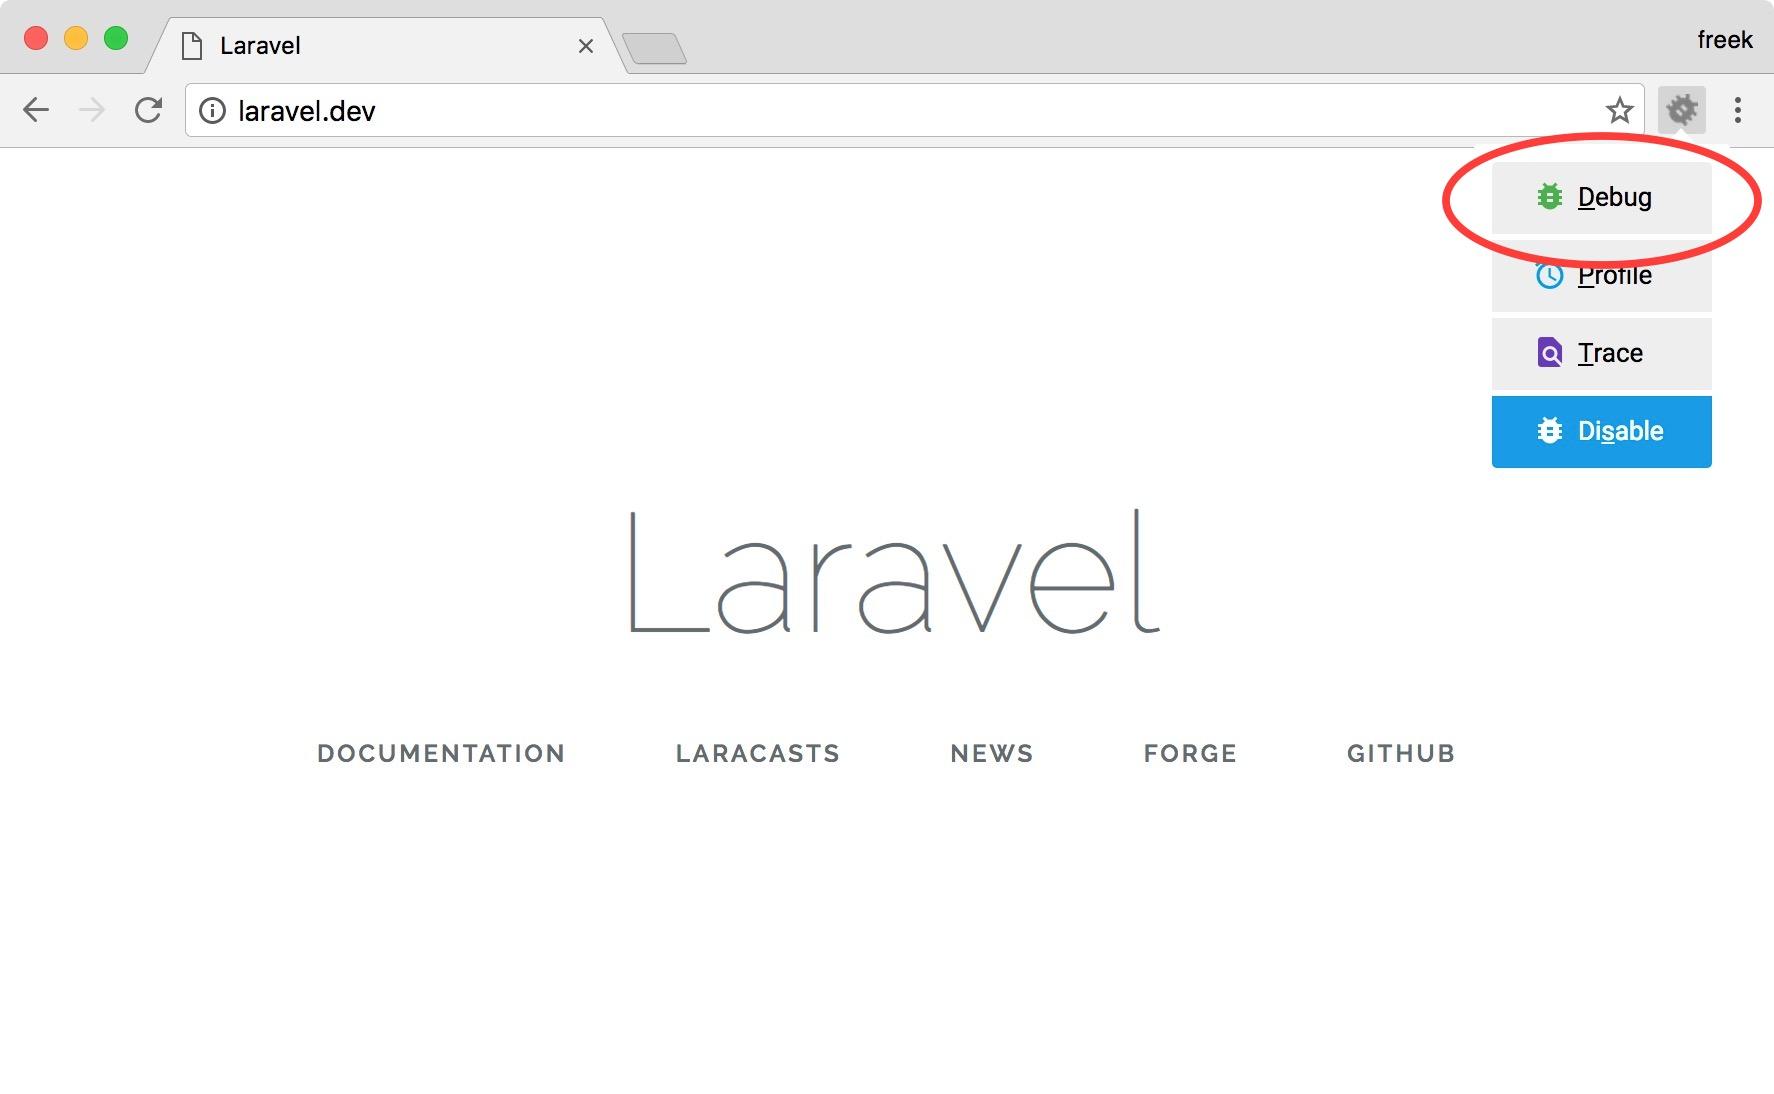 Setting up Xdebug with Laravel Valet - Freek Van der Herten's blog